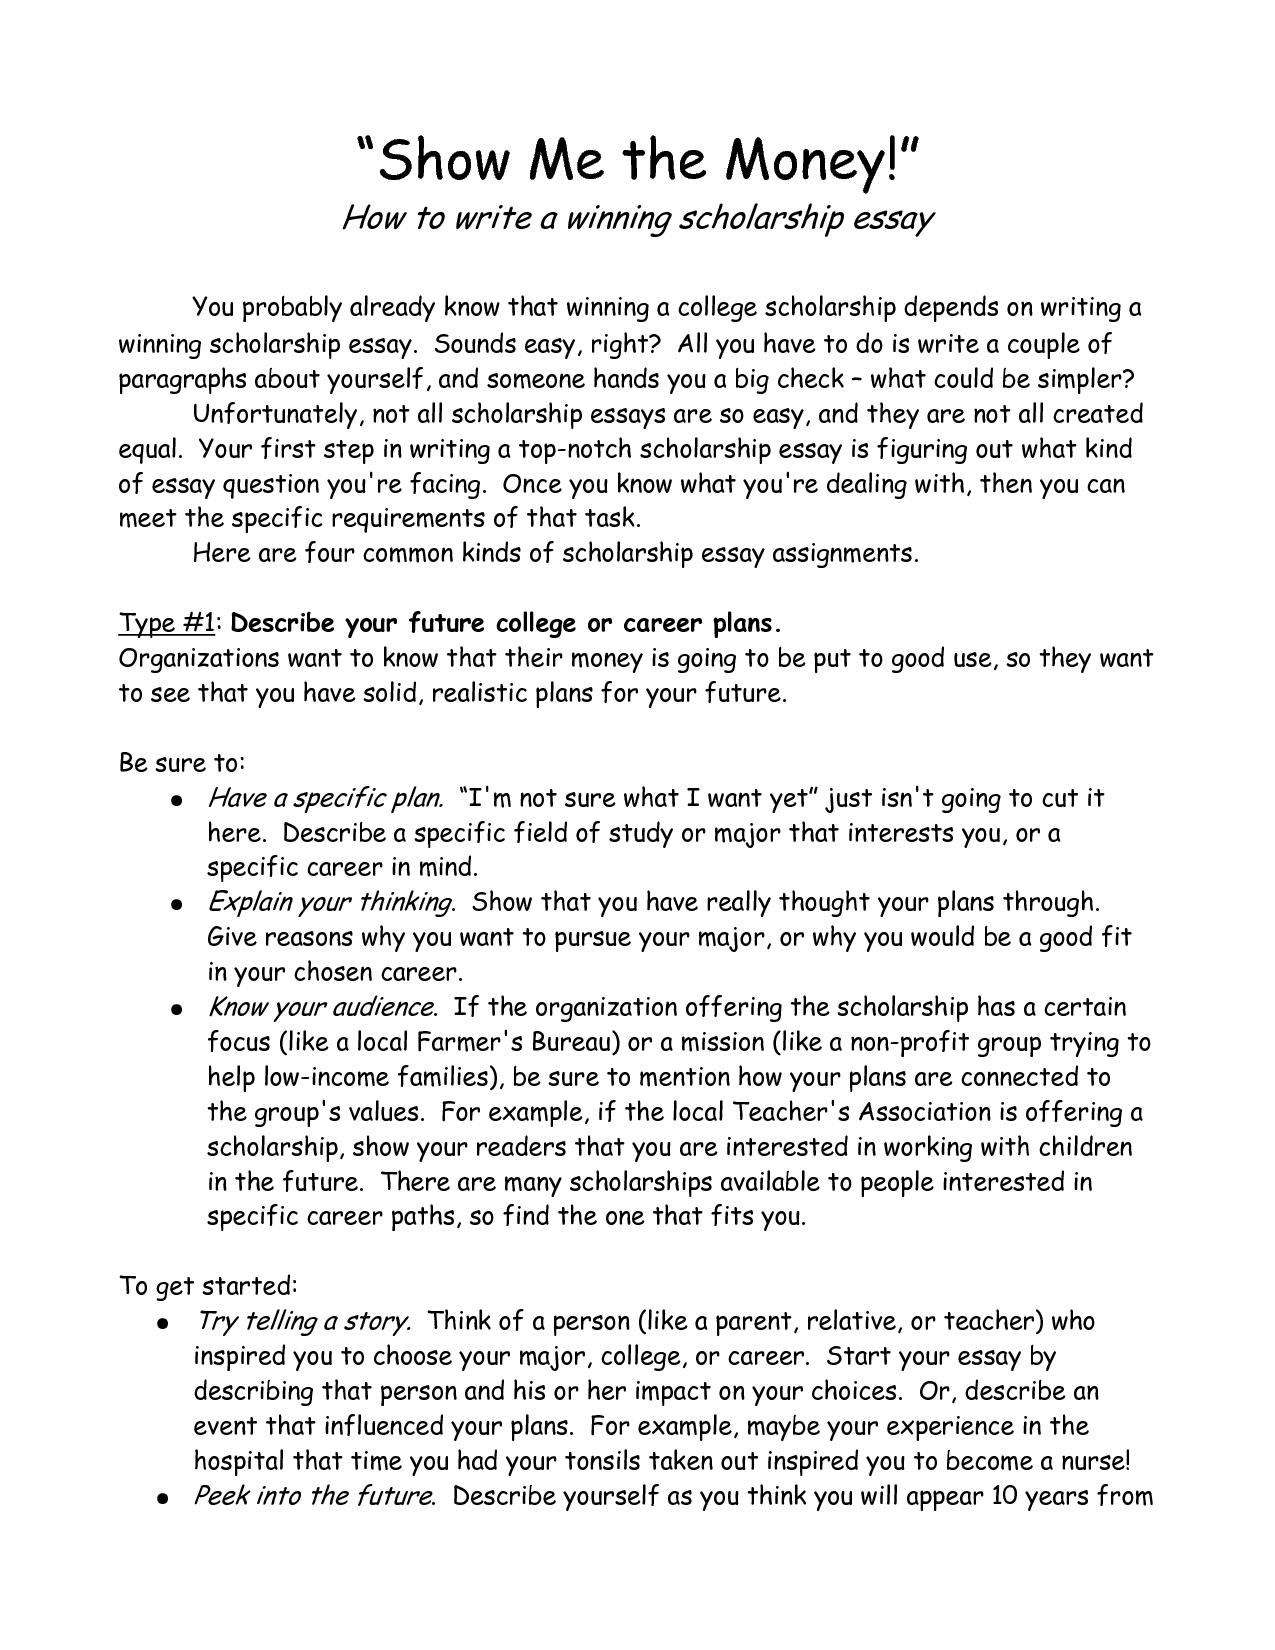 009 Write Essays For Money Professional Scholarship Essay Writing Website College Best University High School Reddit Full